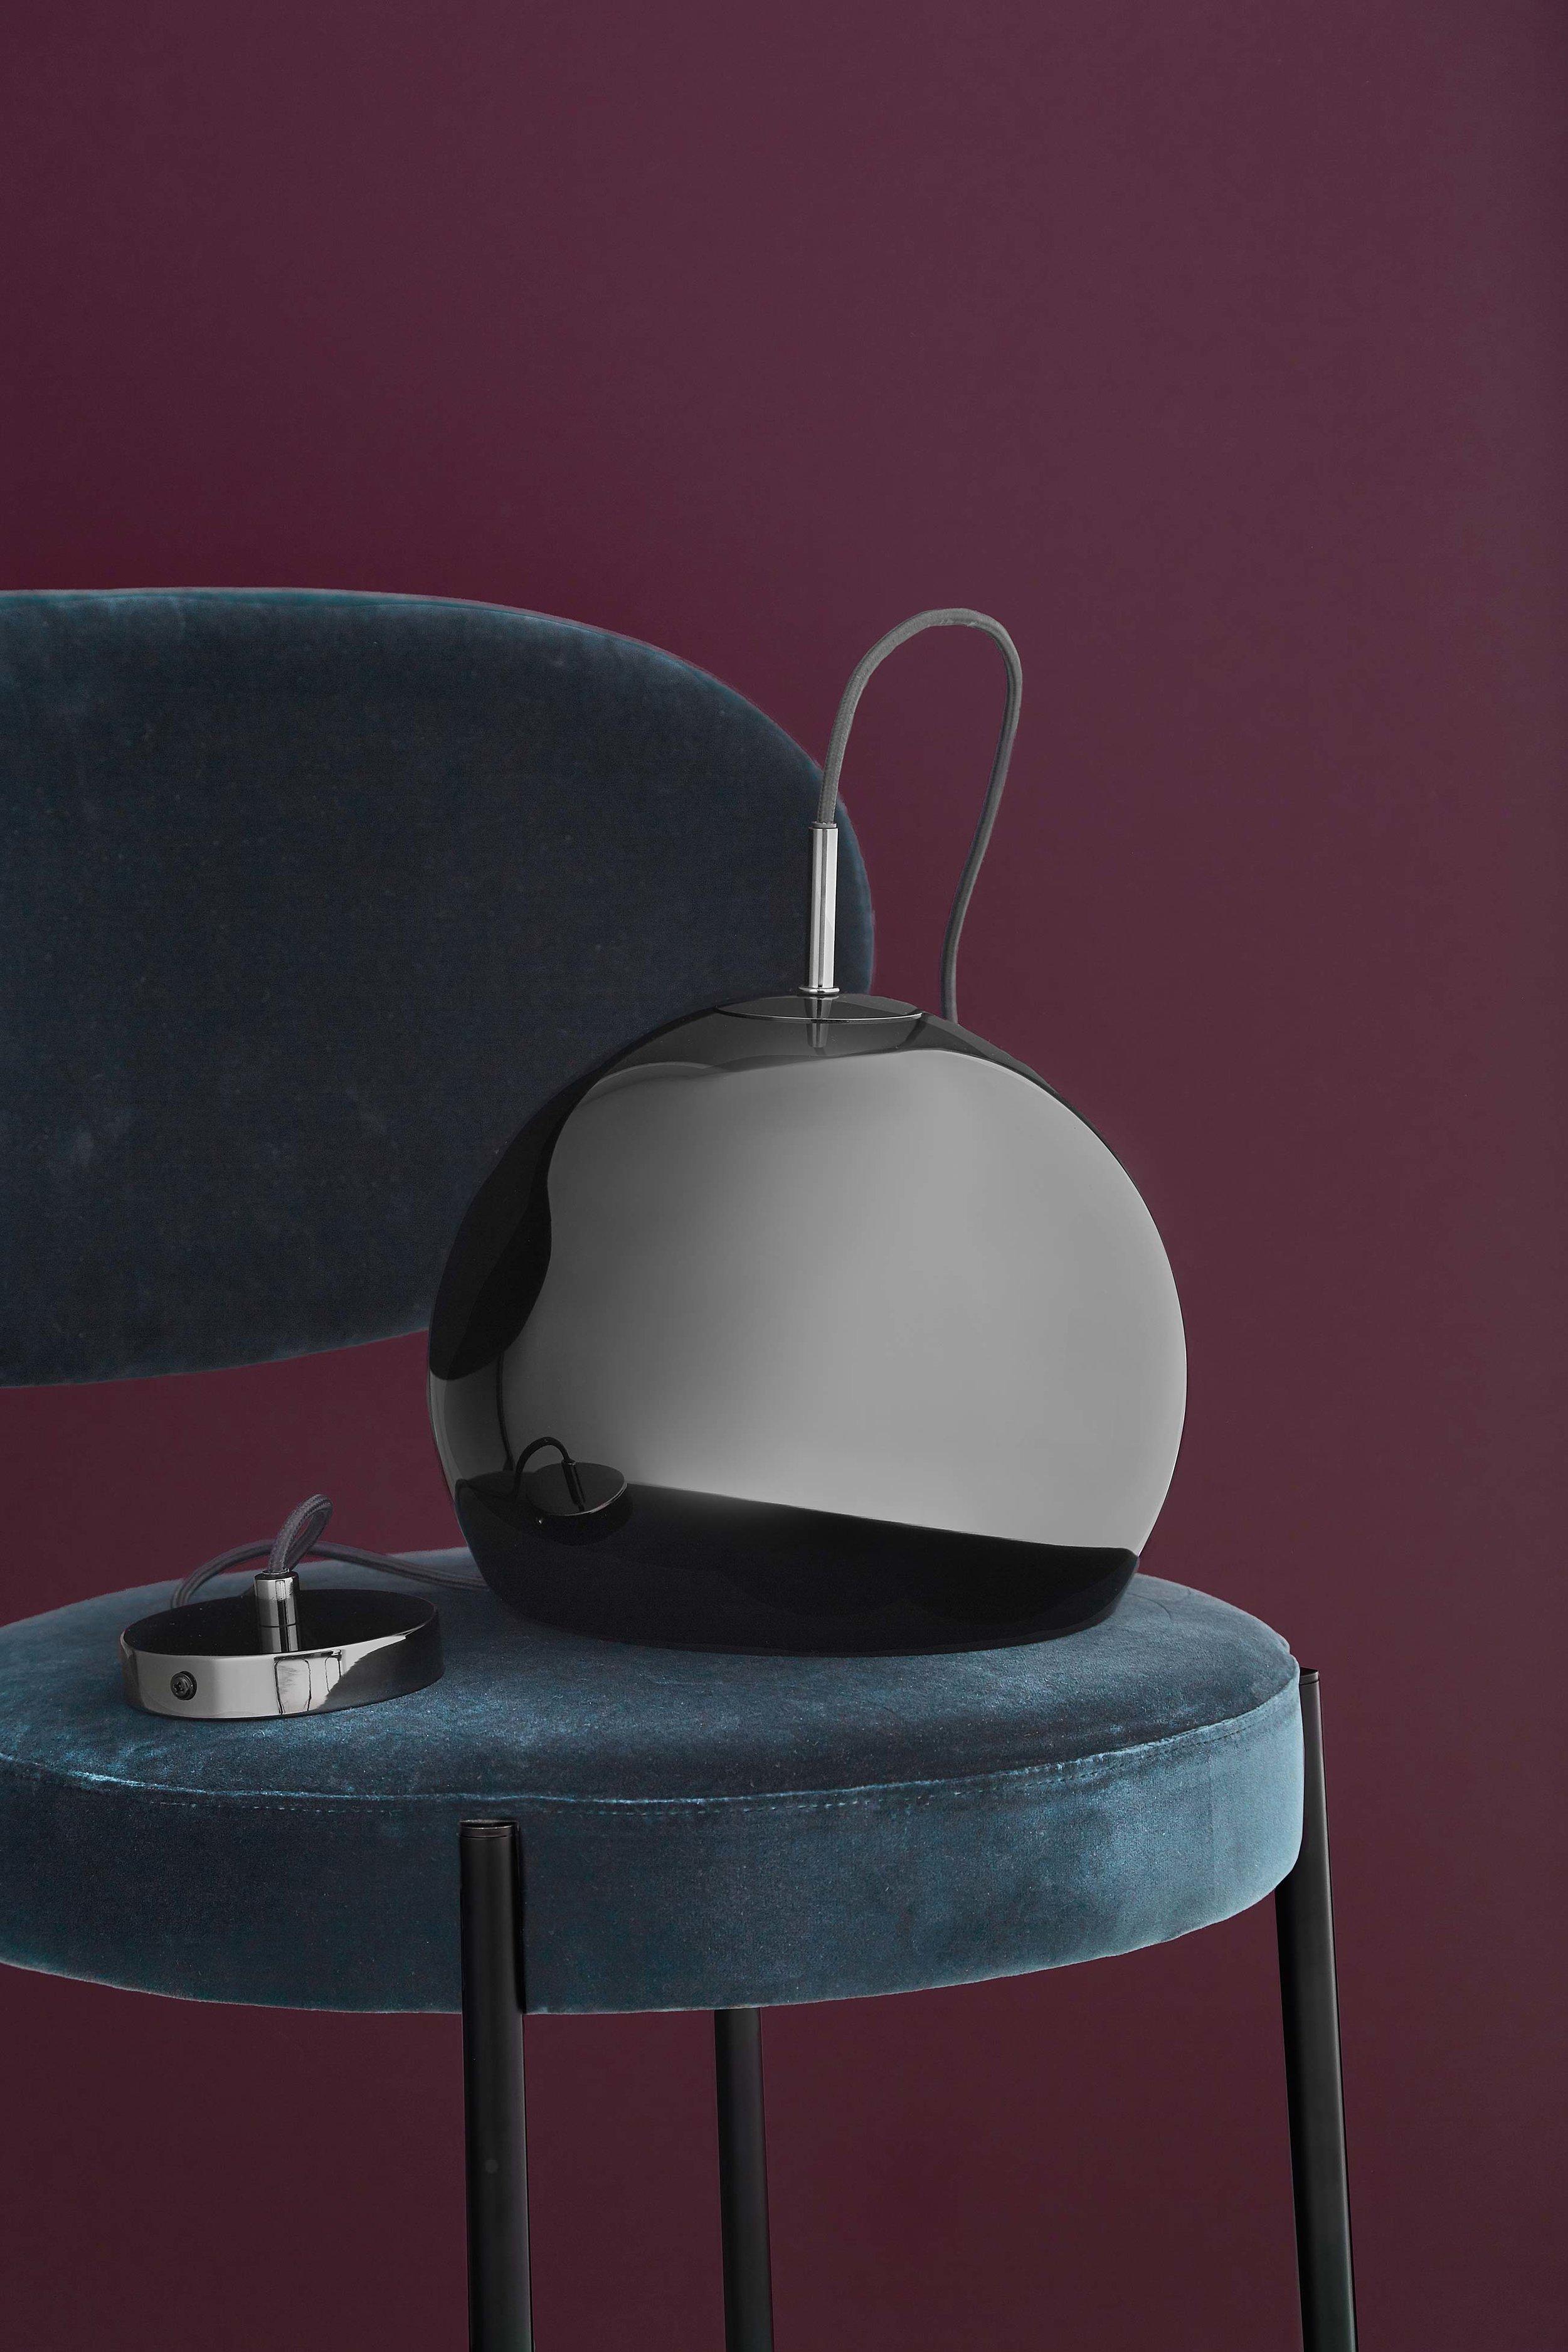 Ball-pendant-25-cm-black-chome-glossy---lifestyle-studio-Horsens-1370.jpg